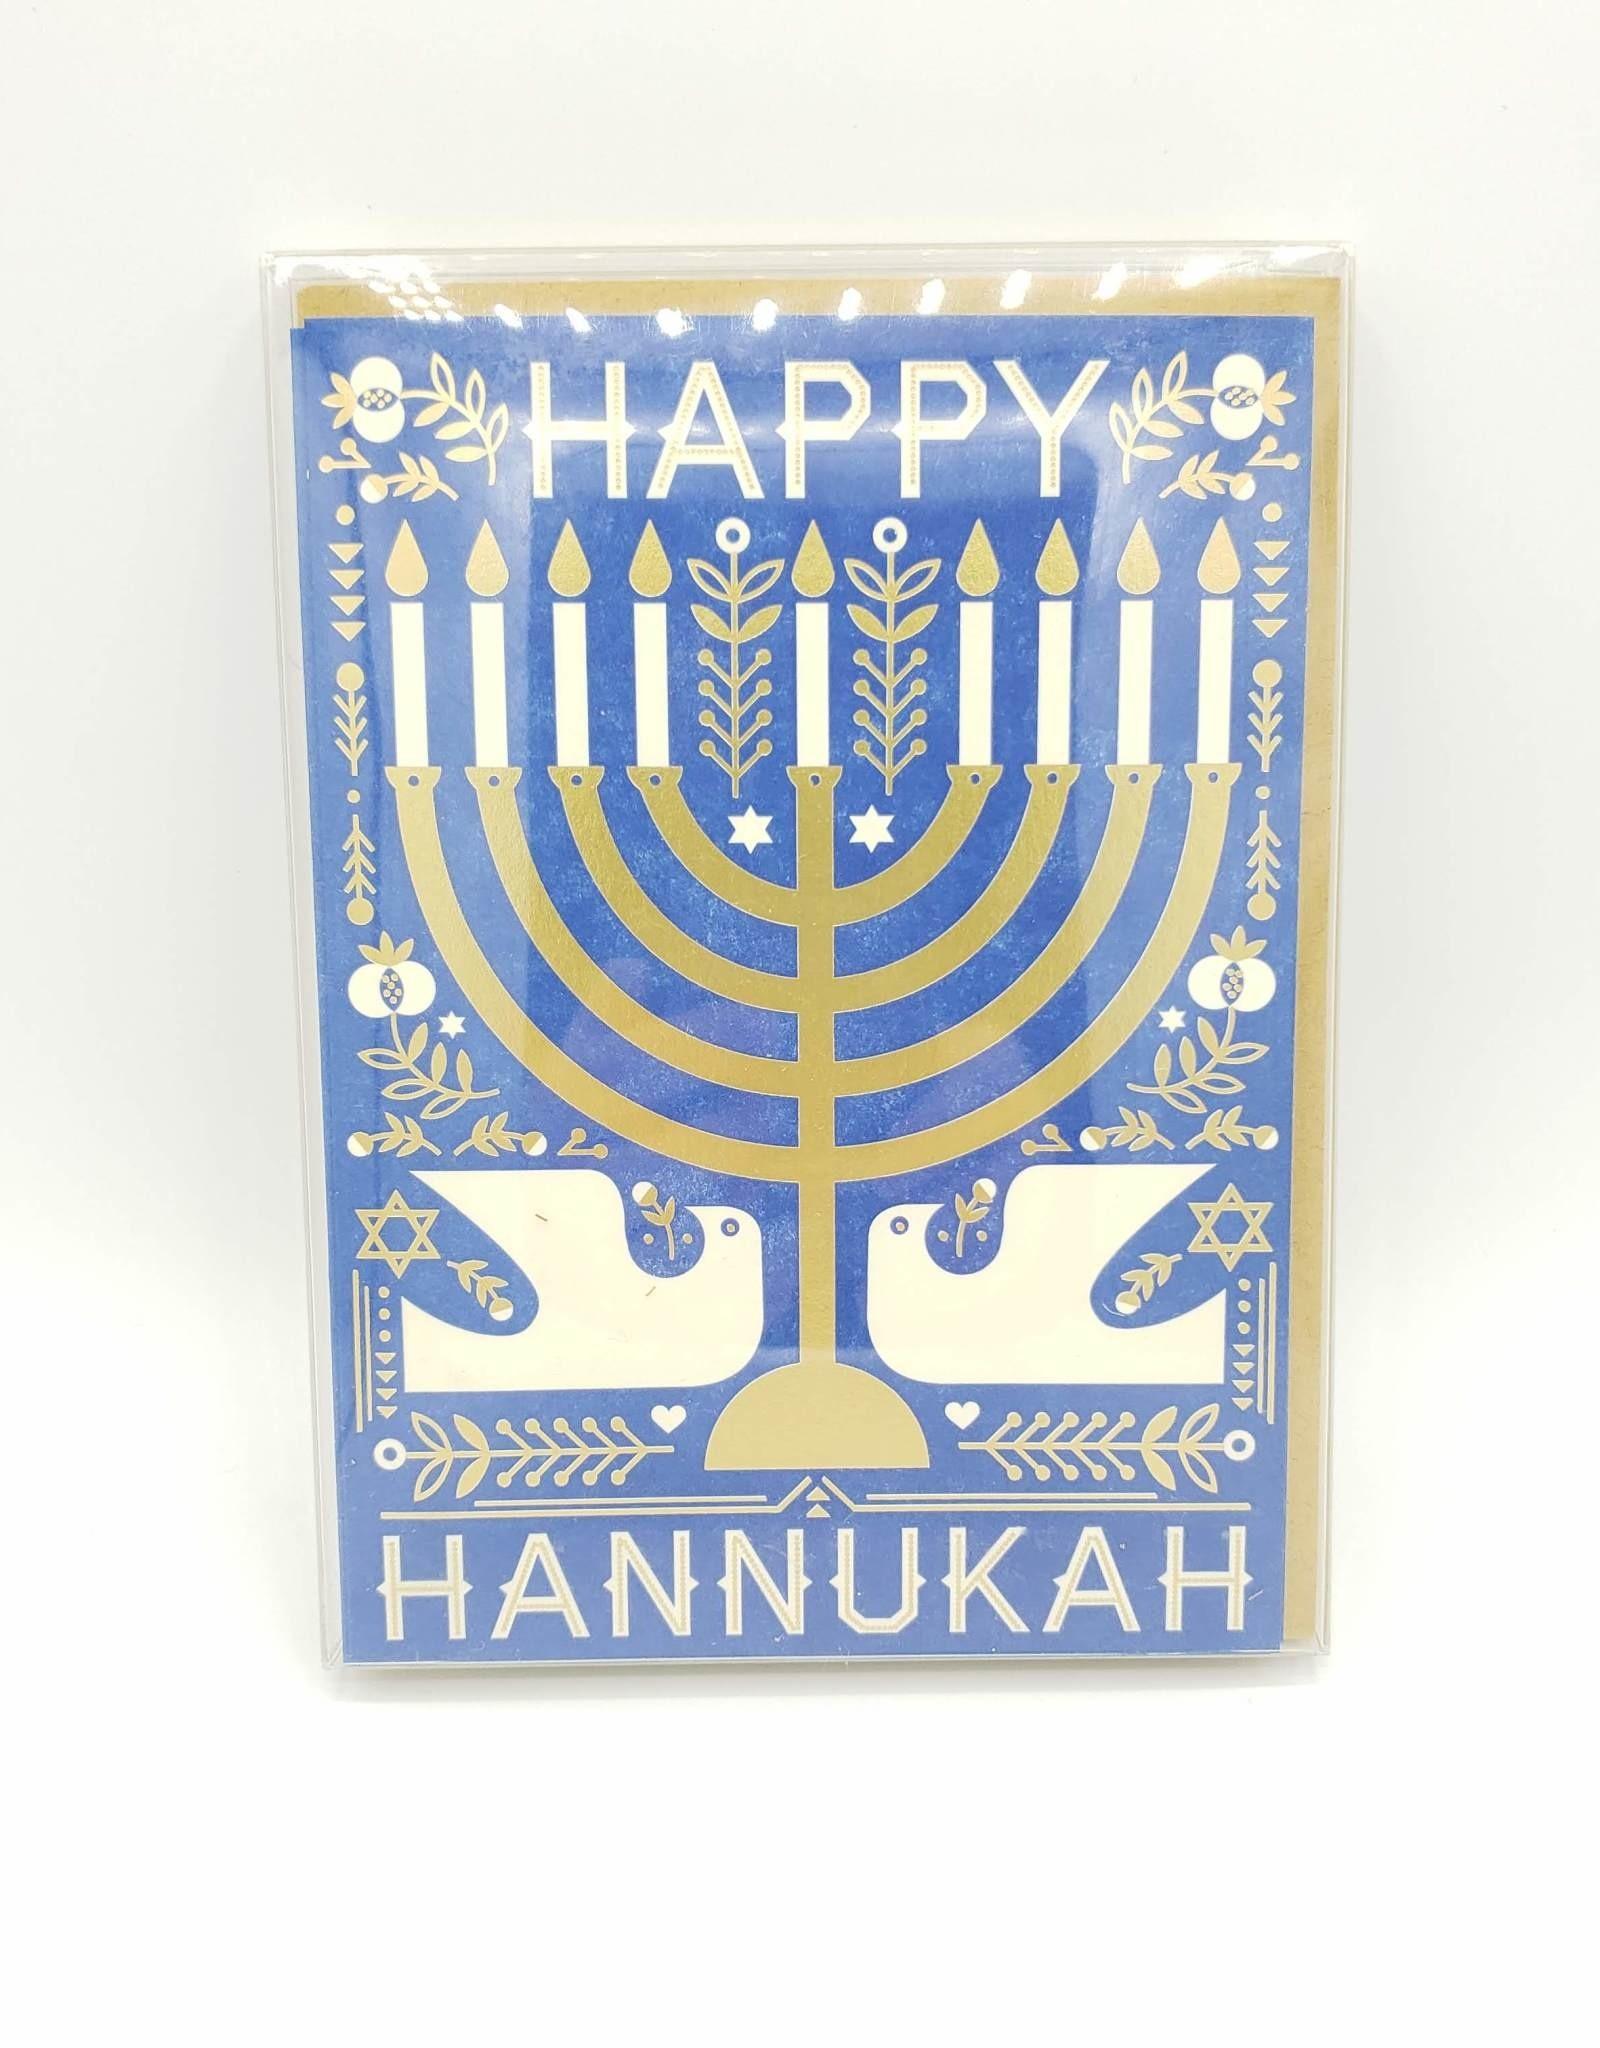 Hanukkah Holiday Box Set - Egg Press